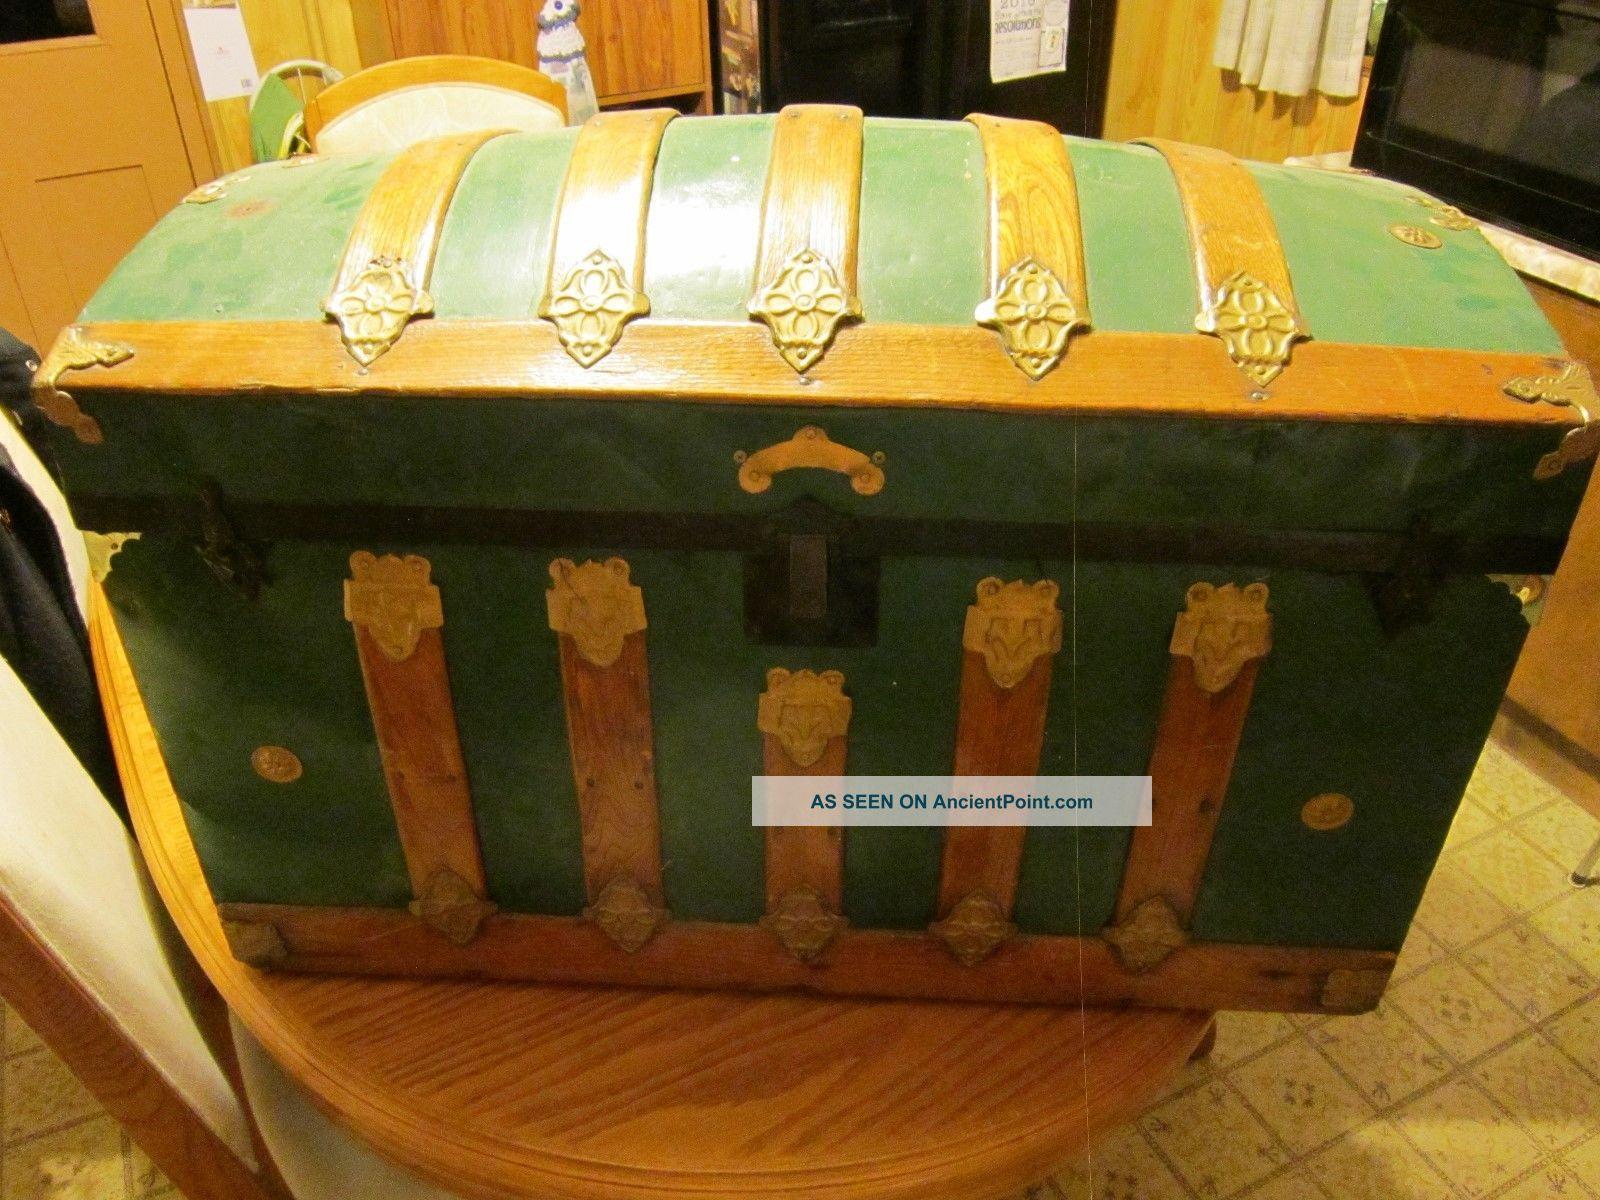 Vintage Camelback Trunk Storage Chest - - 34